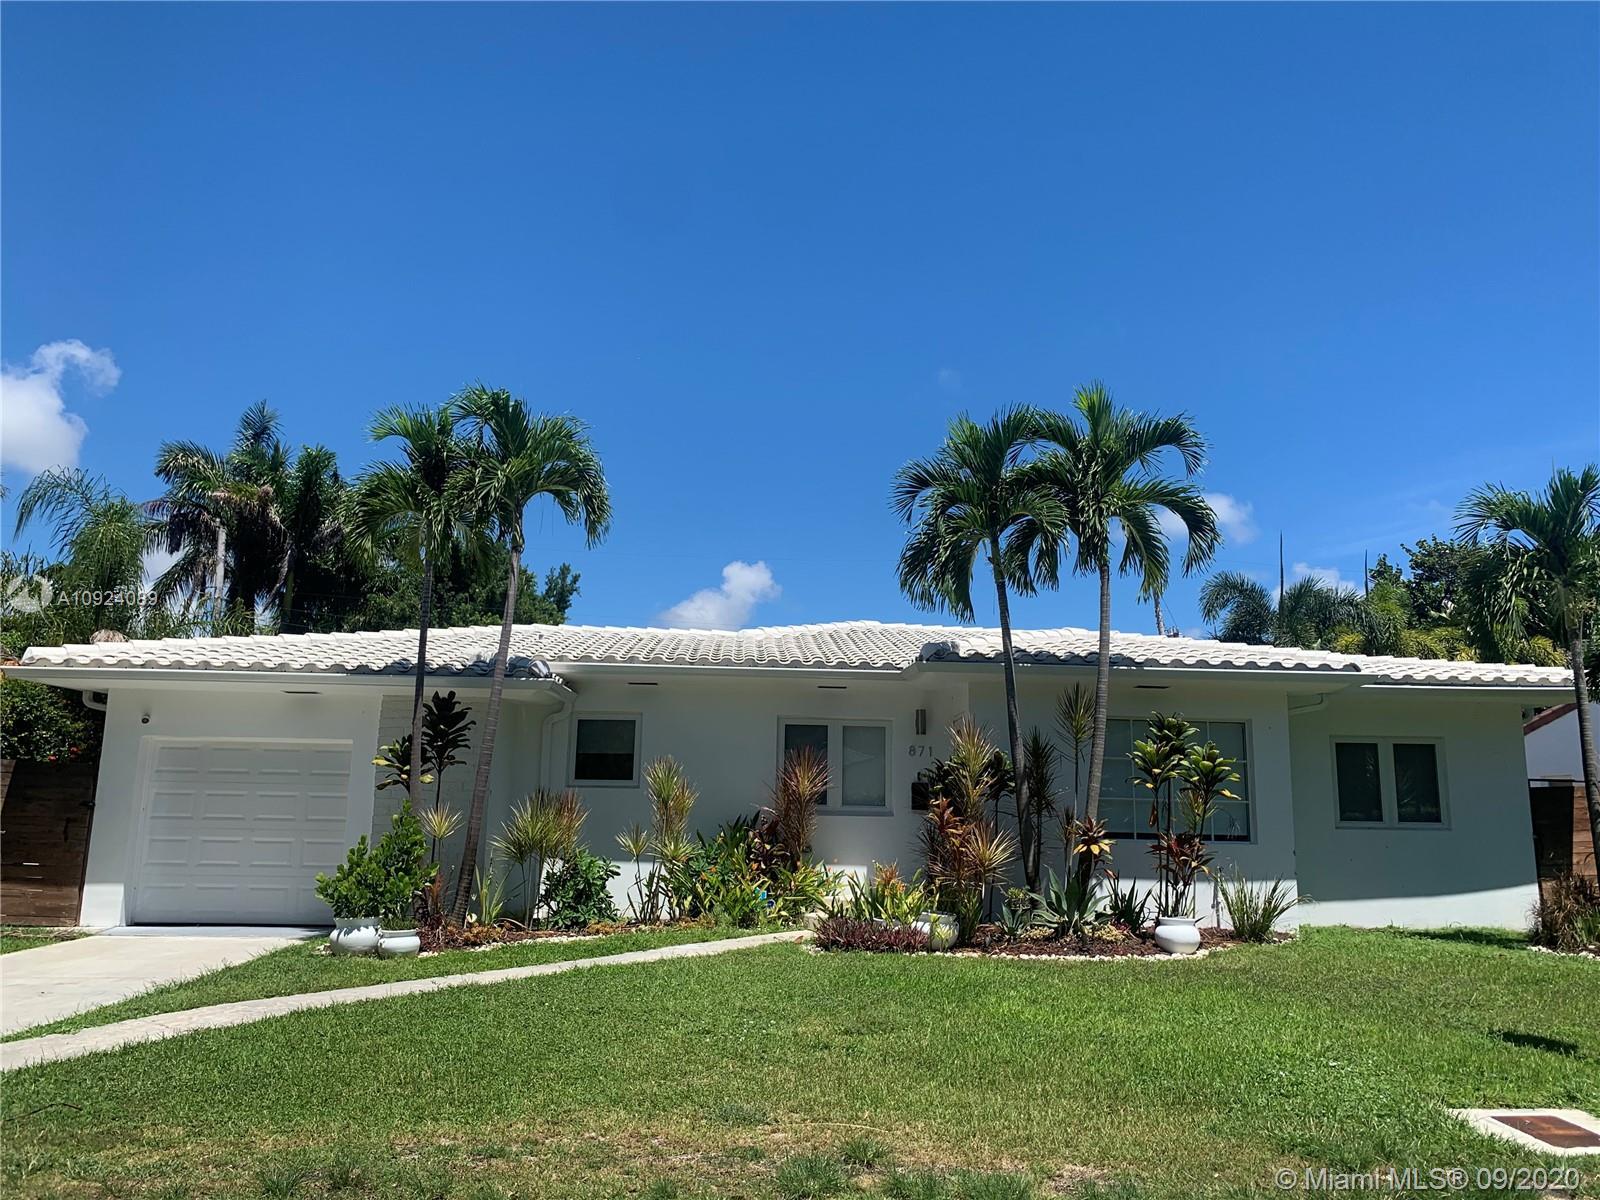 Washington Place - 871 NE 71st St, Miami, FL 33138